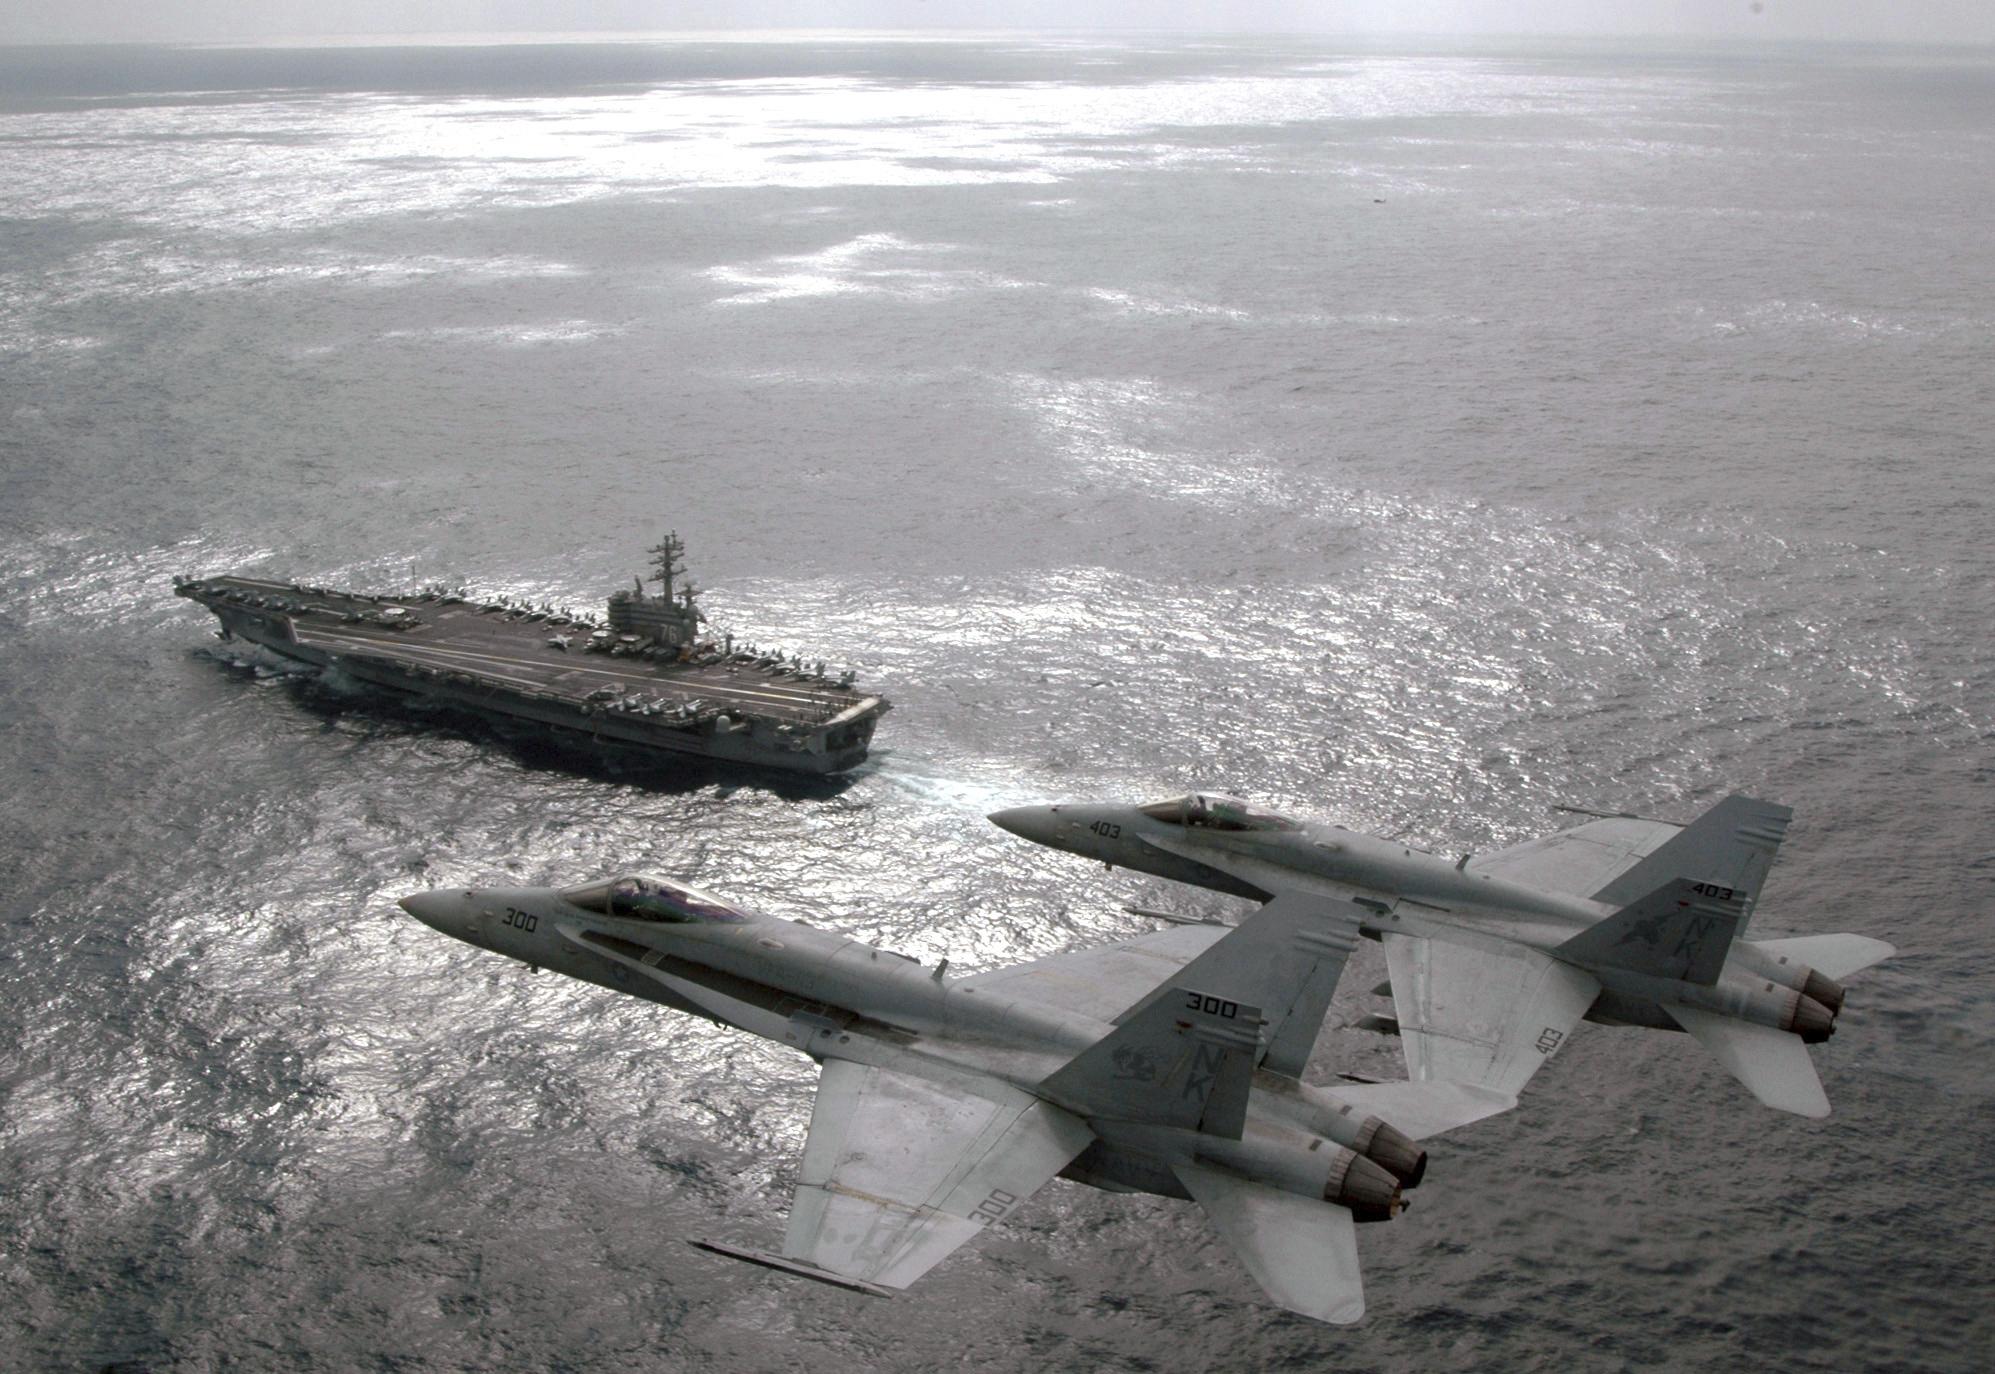 U.S. Jets Scramble After Russian Aircraft Buzzes USS Ronald Reagan Off South Korea Featured